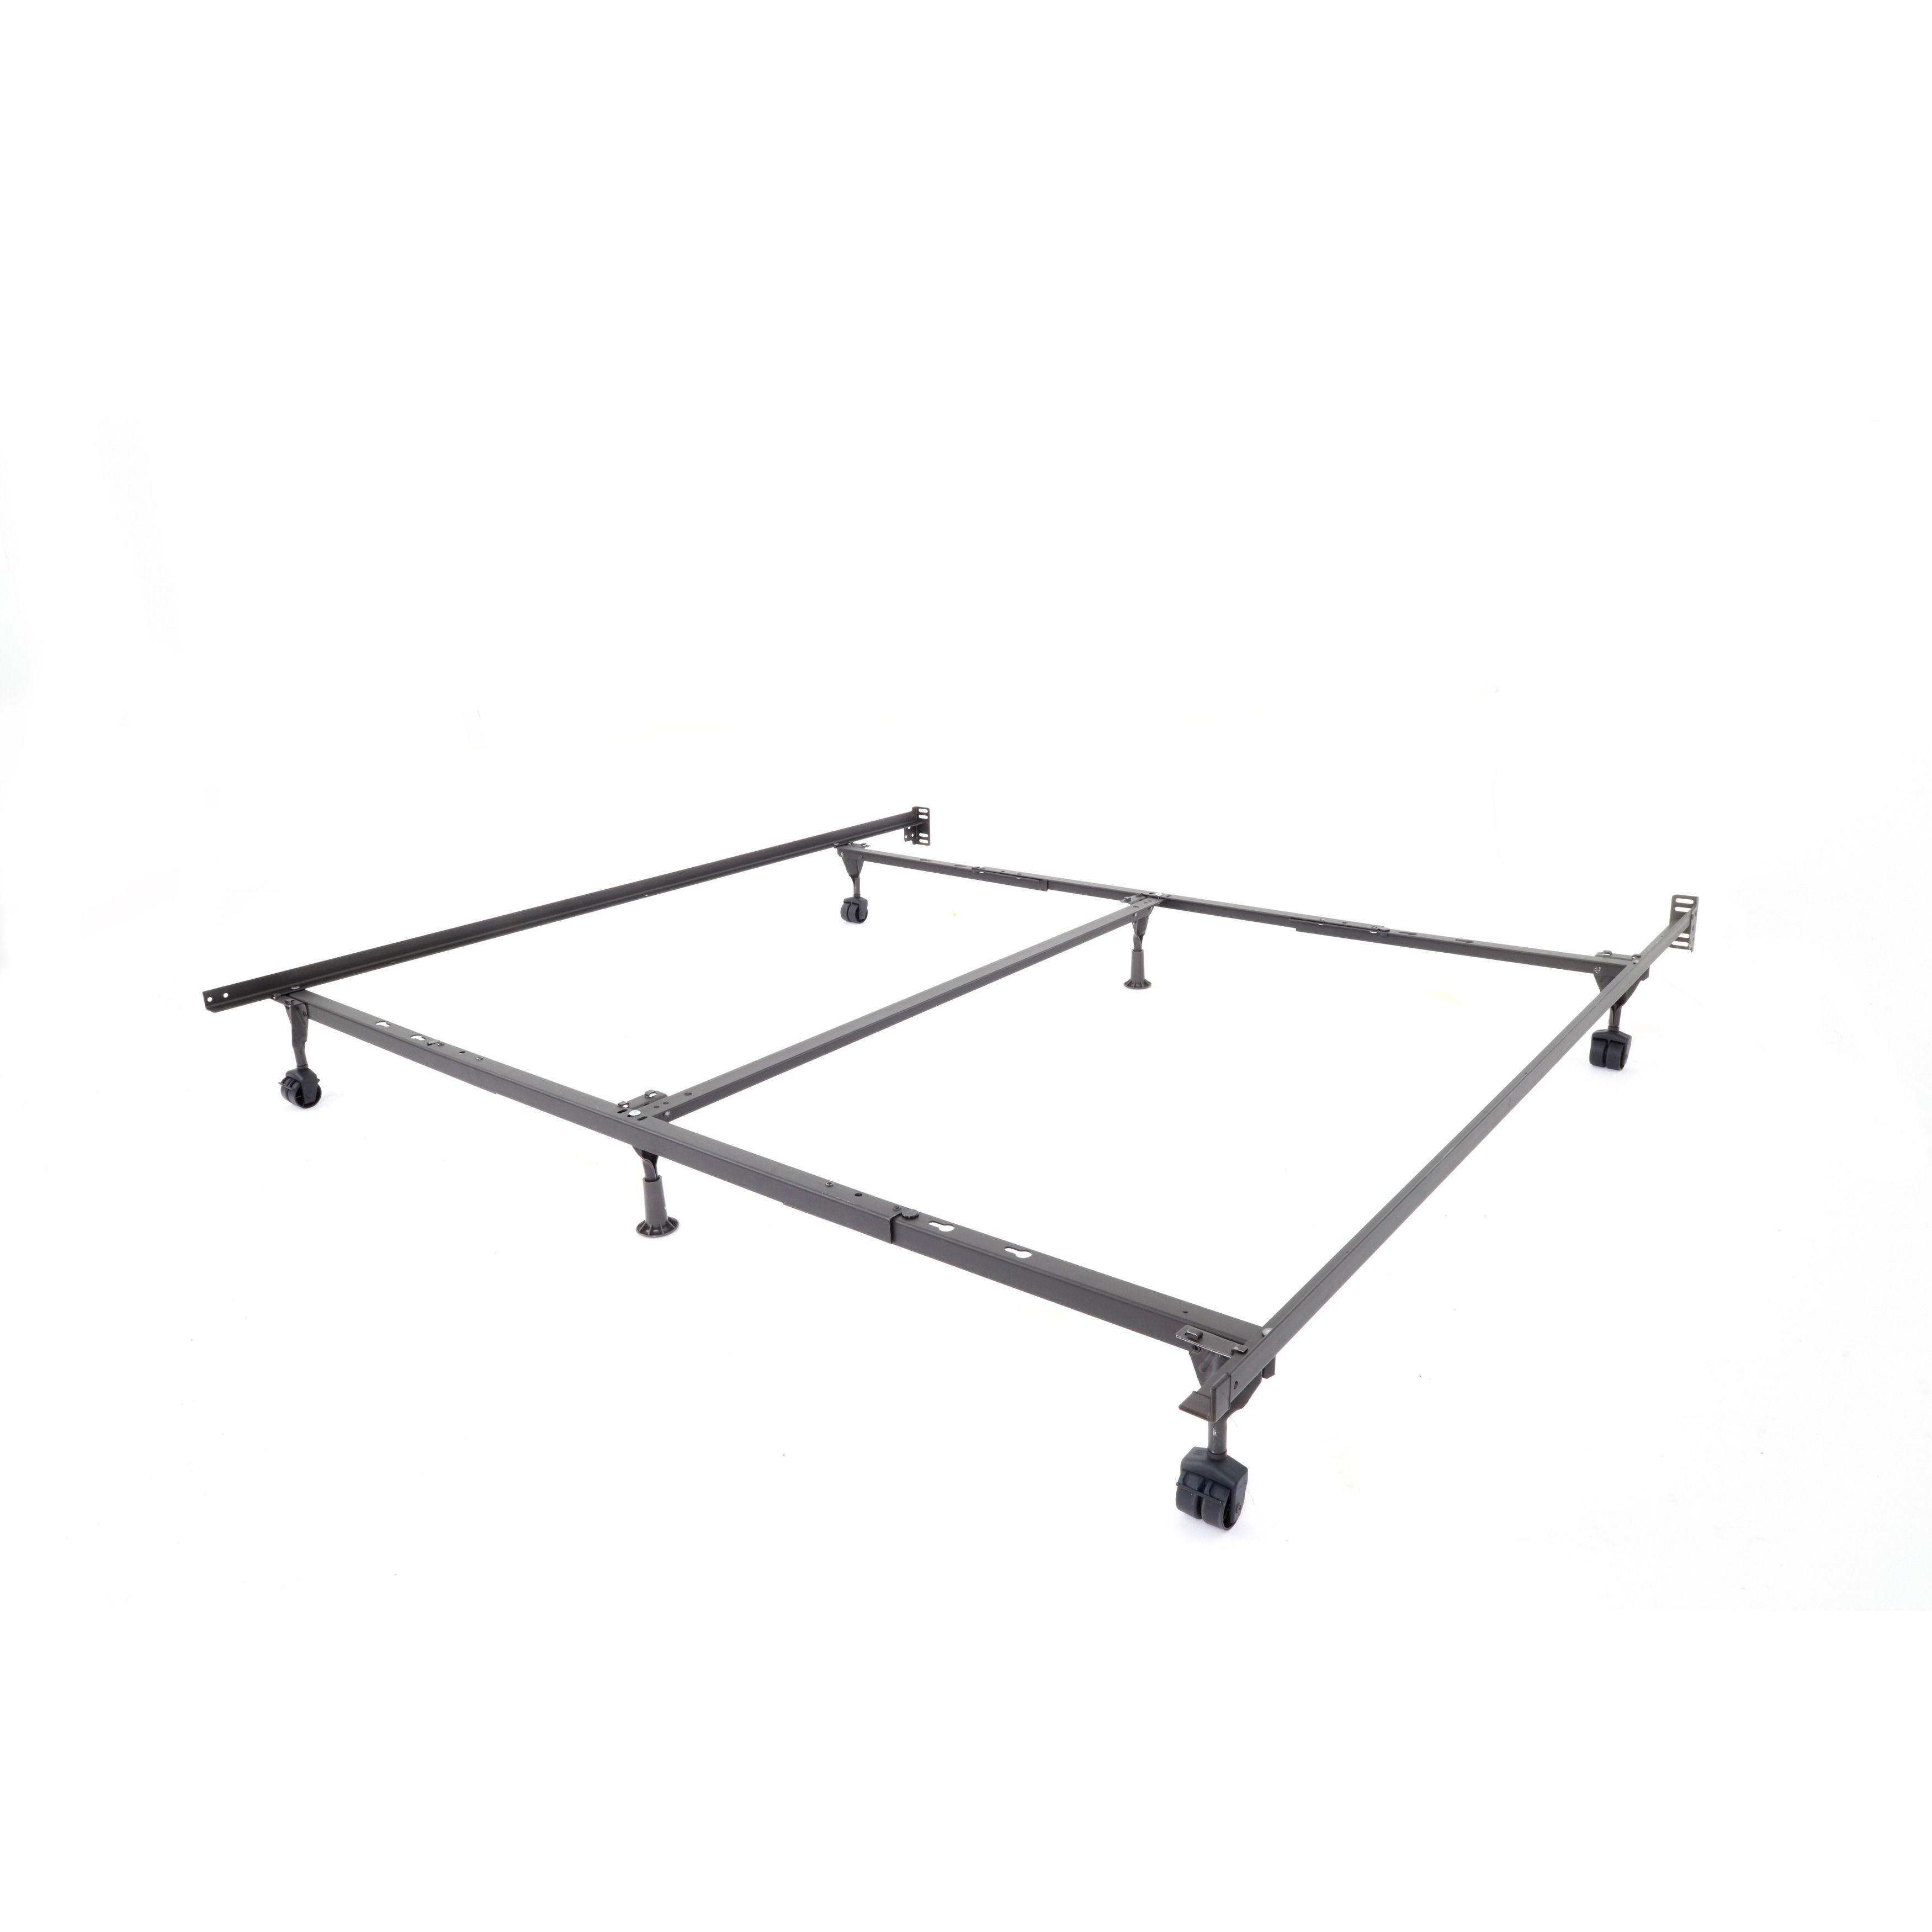 Insta-Lock Queen King Cal King Bed Frame (Adjustable), Brown